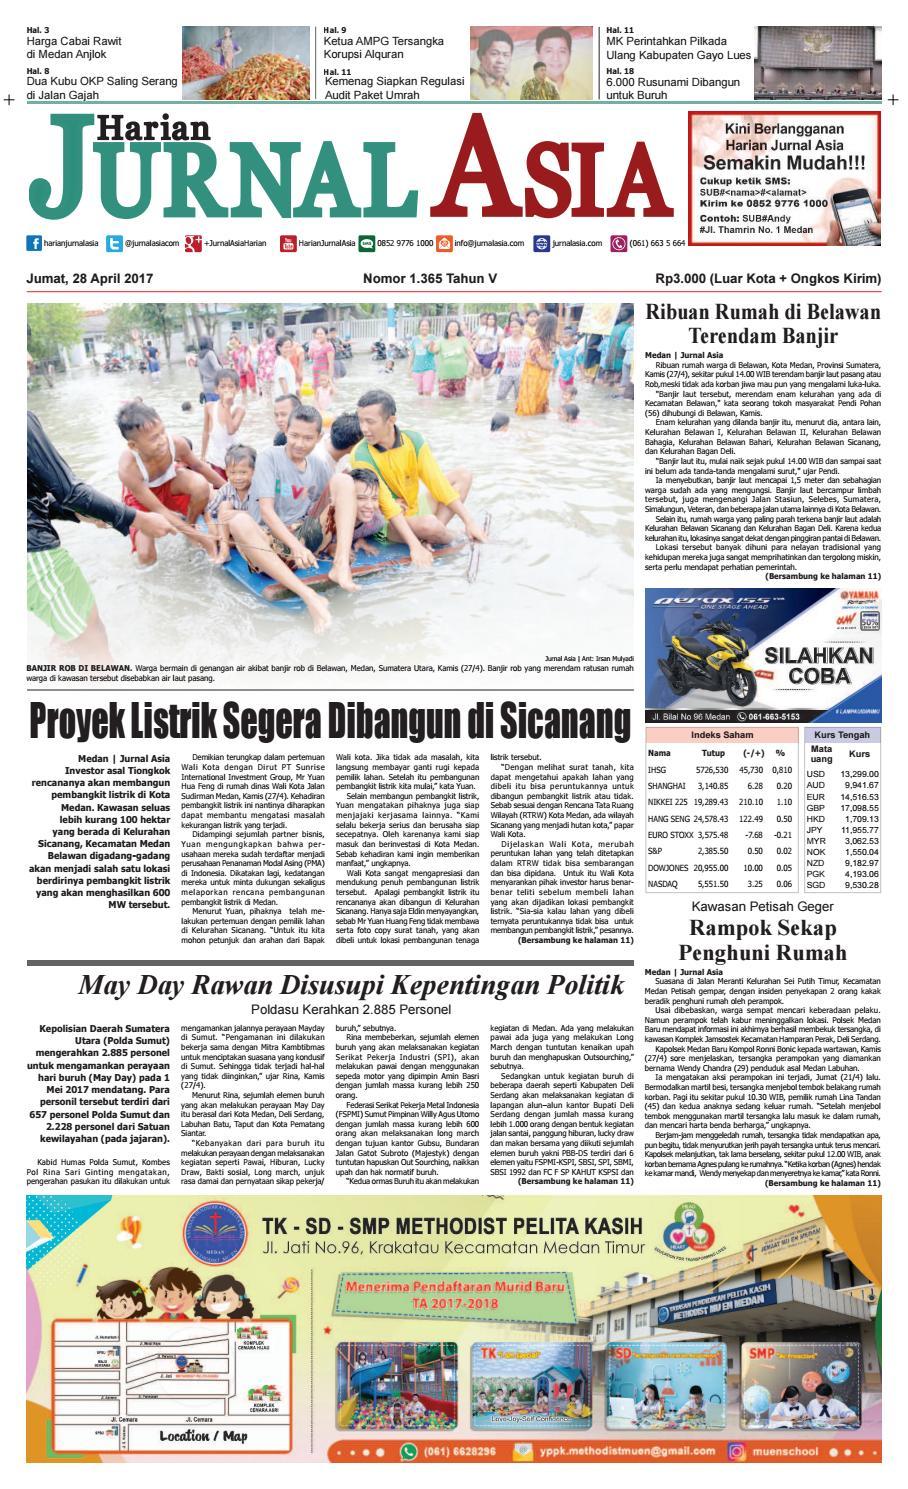 Harian Jurnal Asia Edisi Jumat 28 April 2017 By Produk Ukm Bumn Chesse Pie Khas Balikpapan Medan Issuu